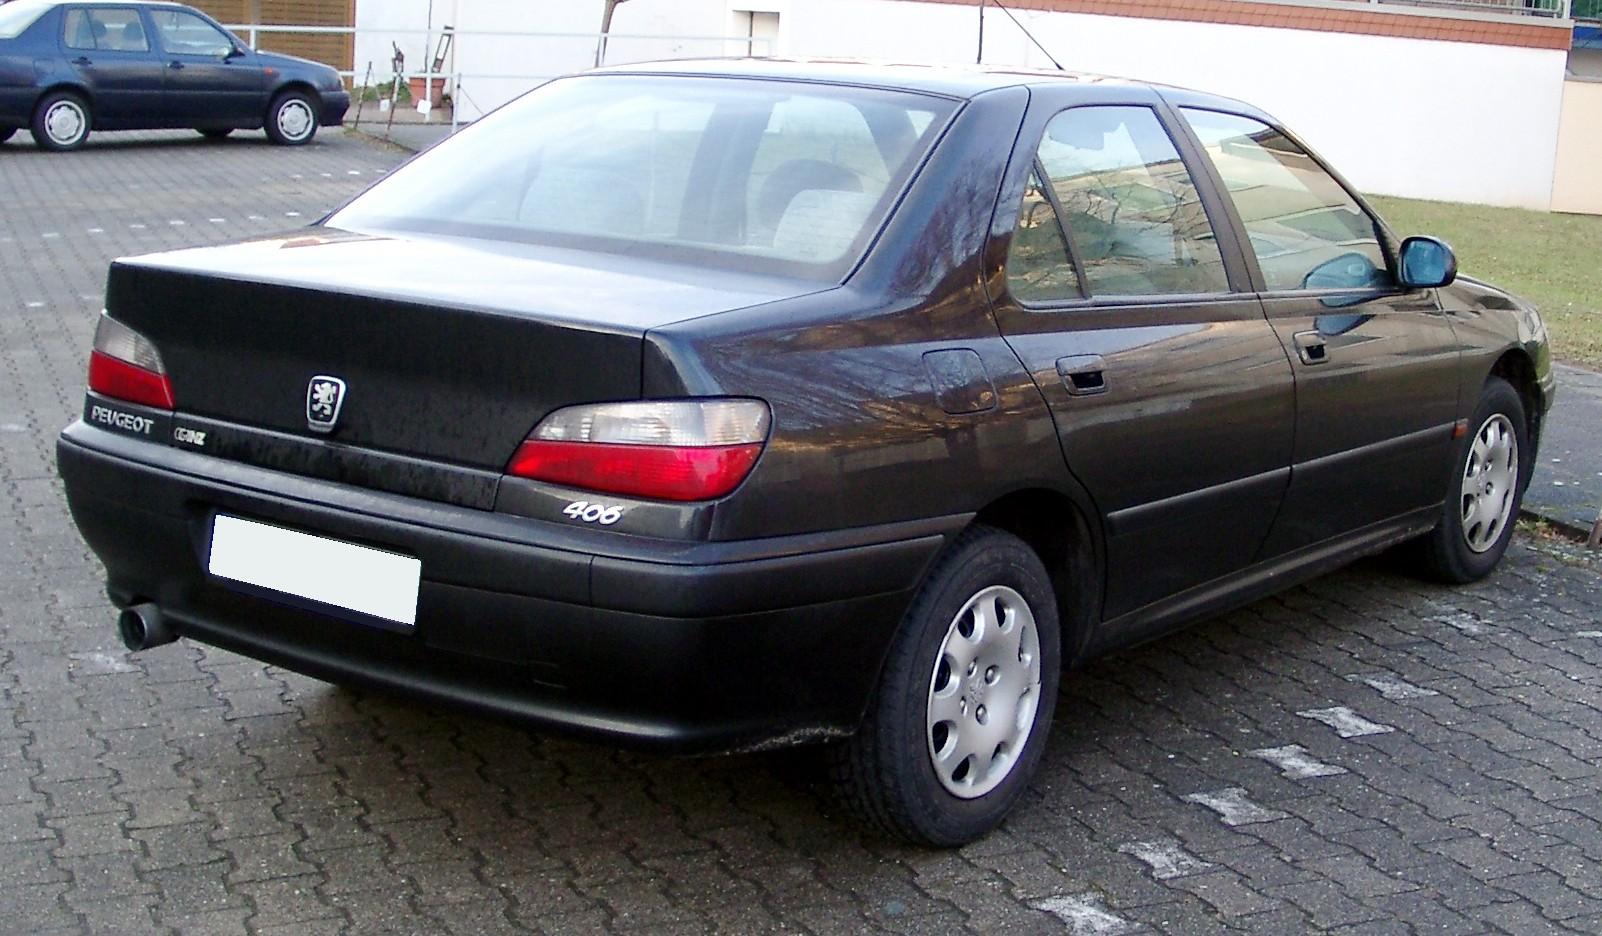 PEUGEOT 406 black